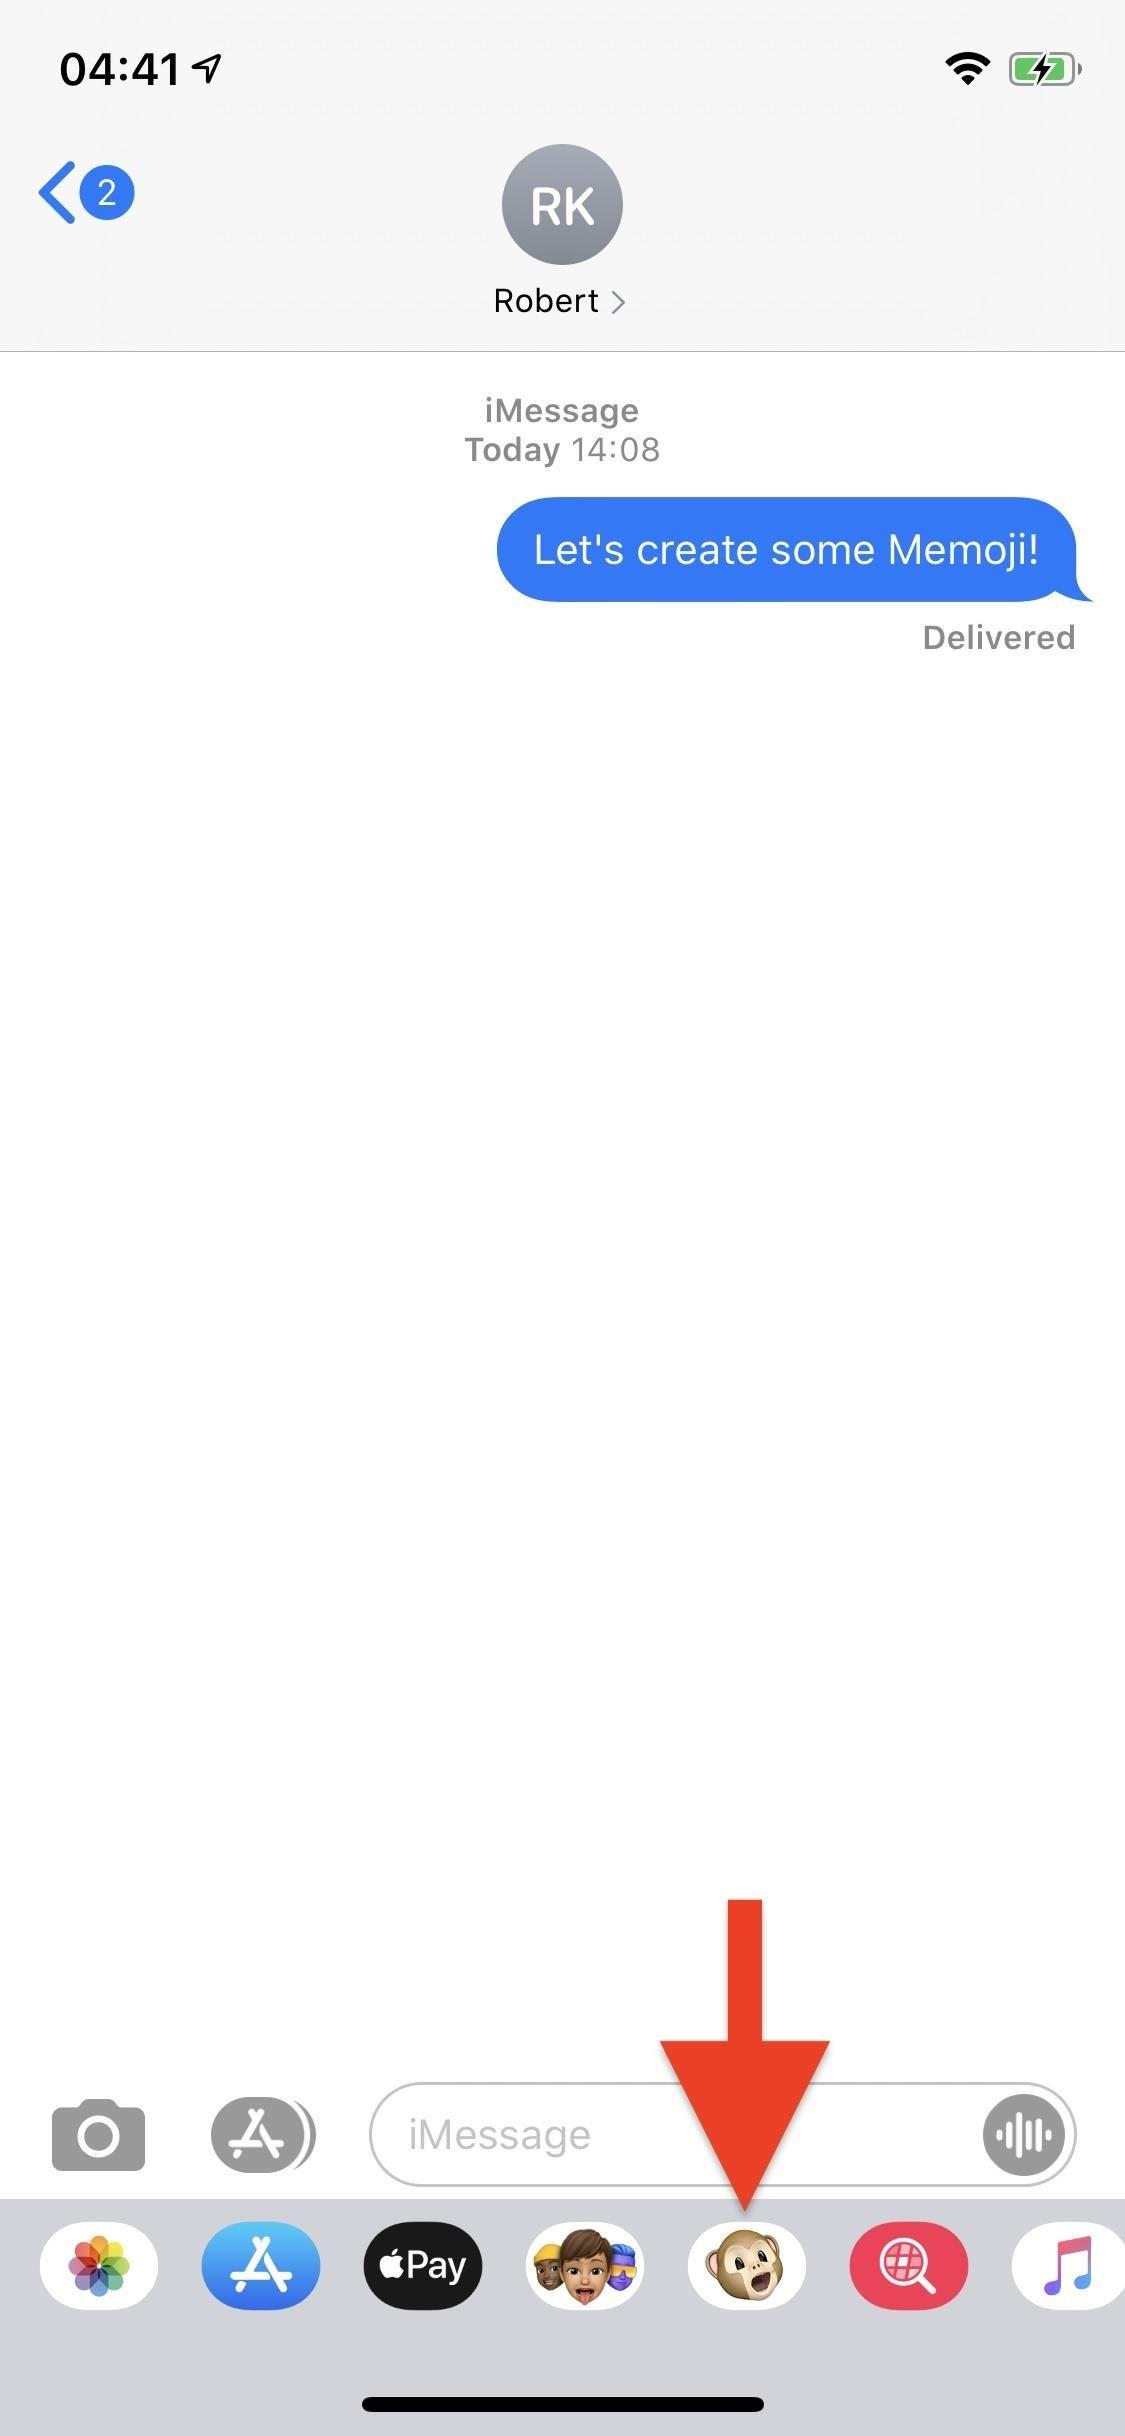 Animoji: How to Create a Personal Memoji on Any iPhone Running iOS 13